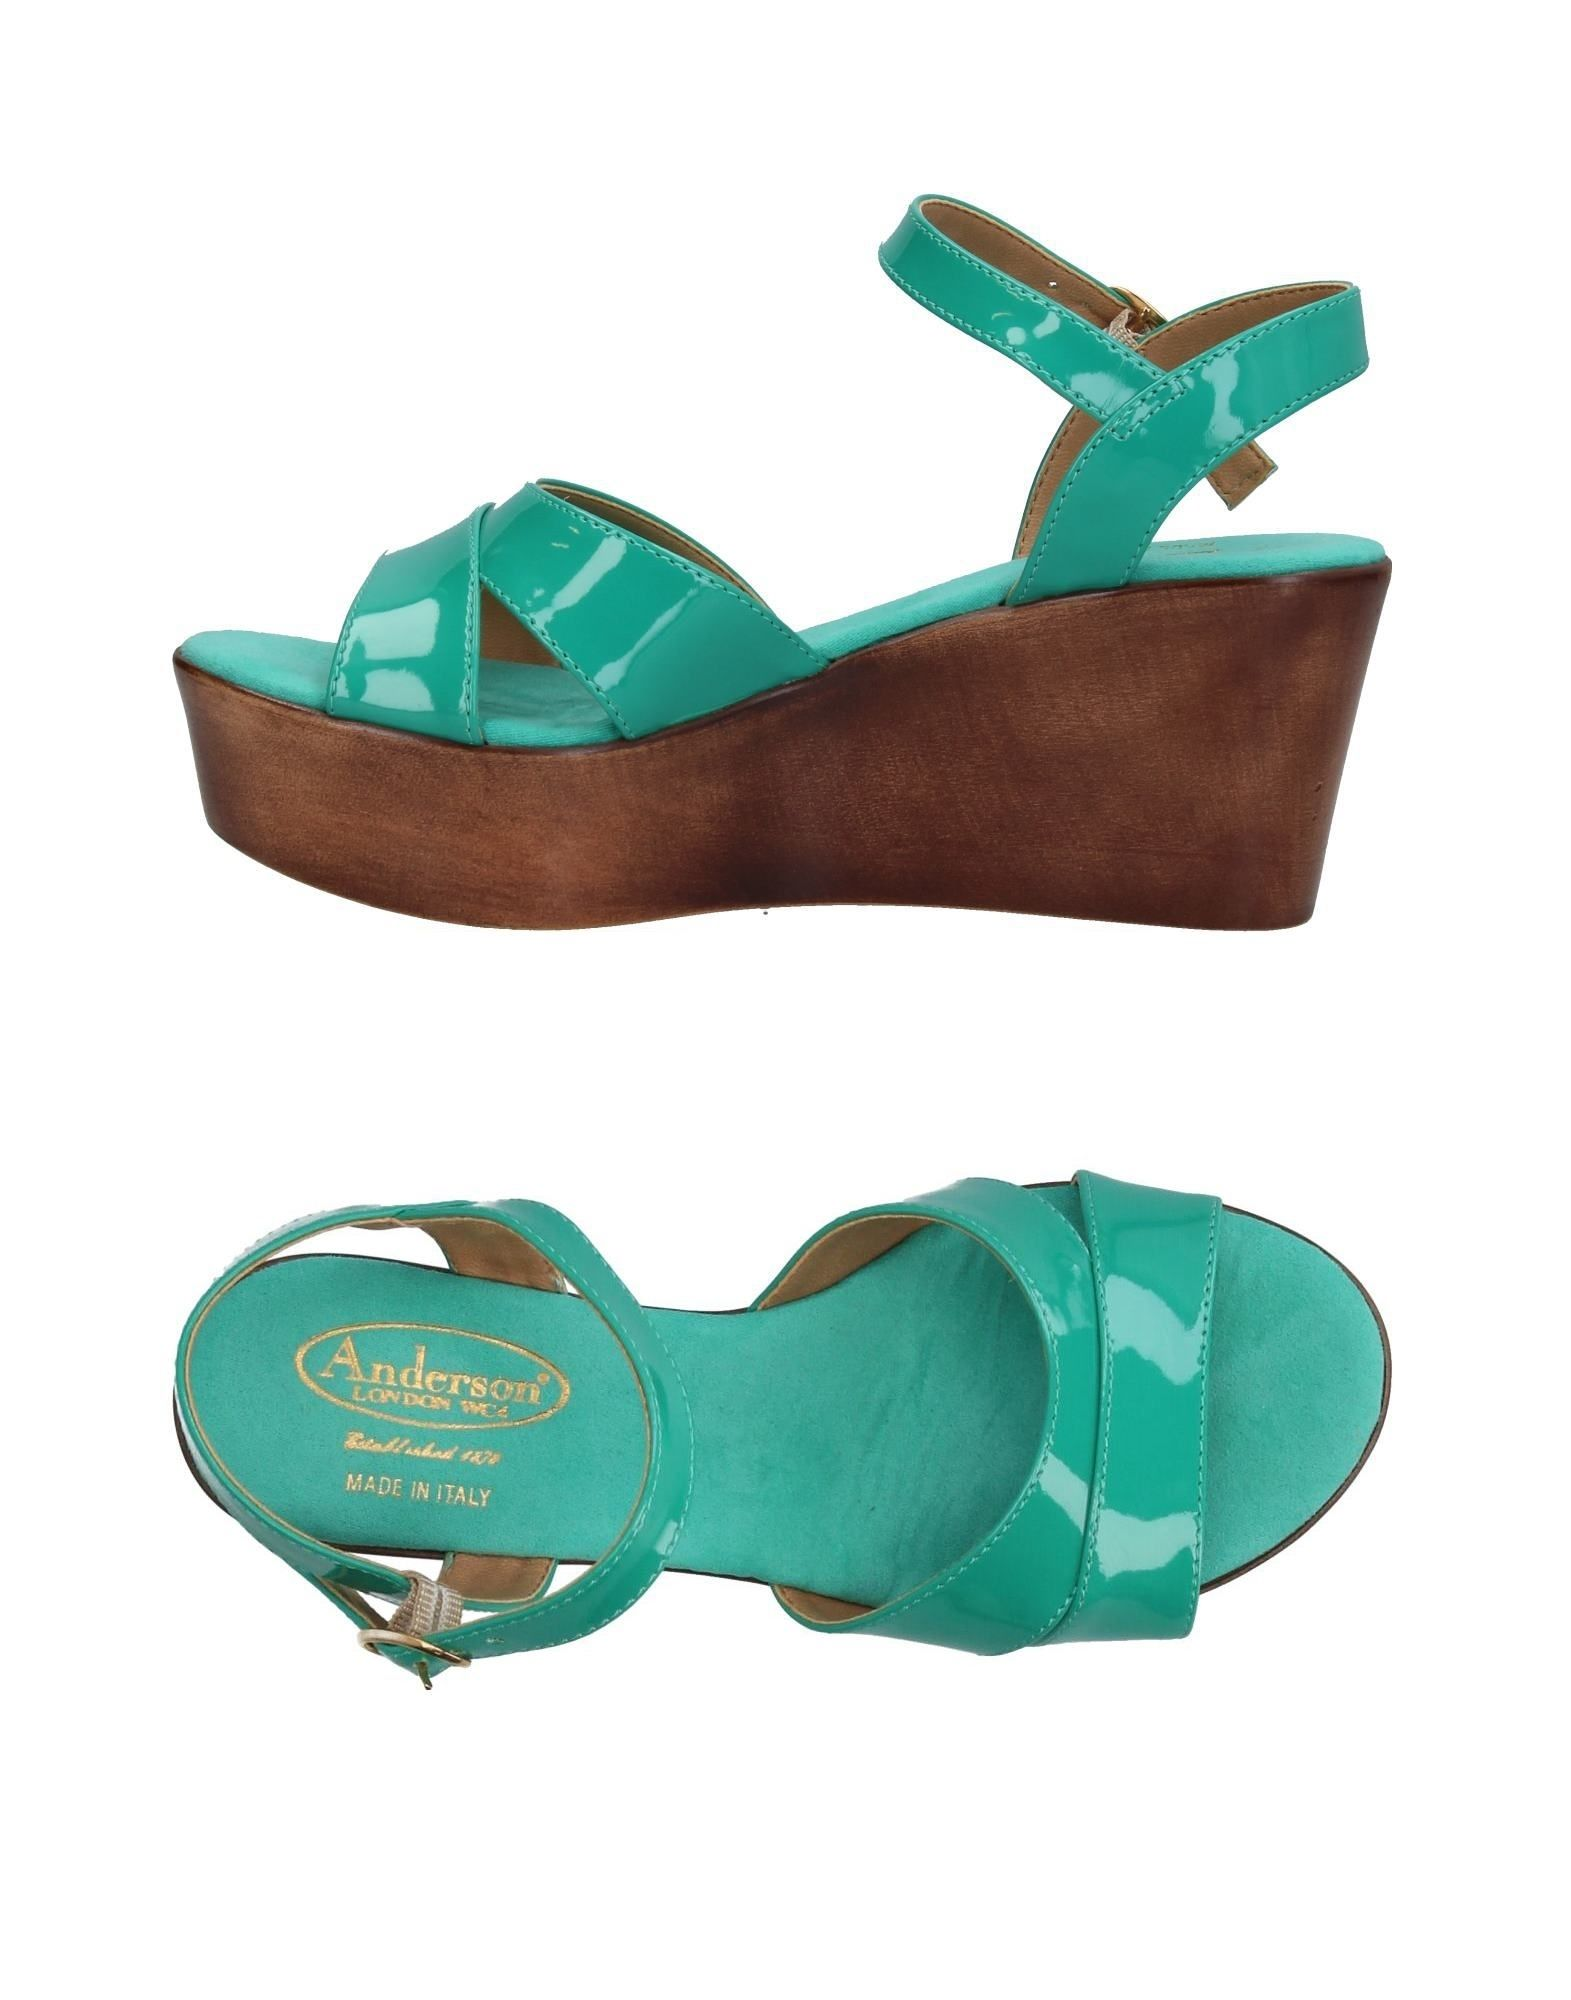 Anderson Sandalen Damen  11384564QQ Gute Qualität beliebte Schuhe